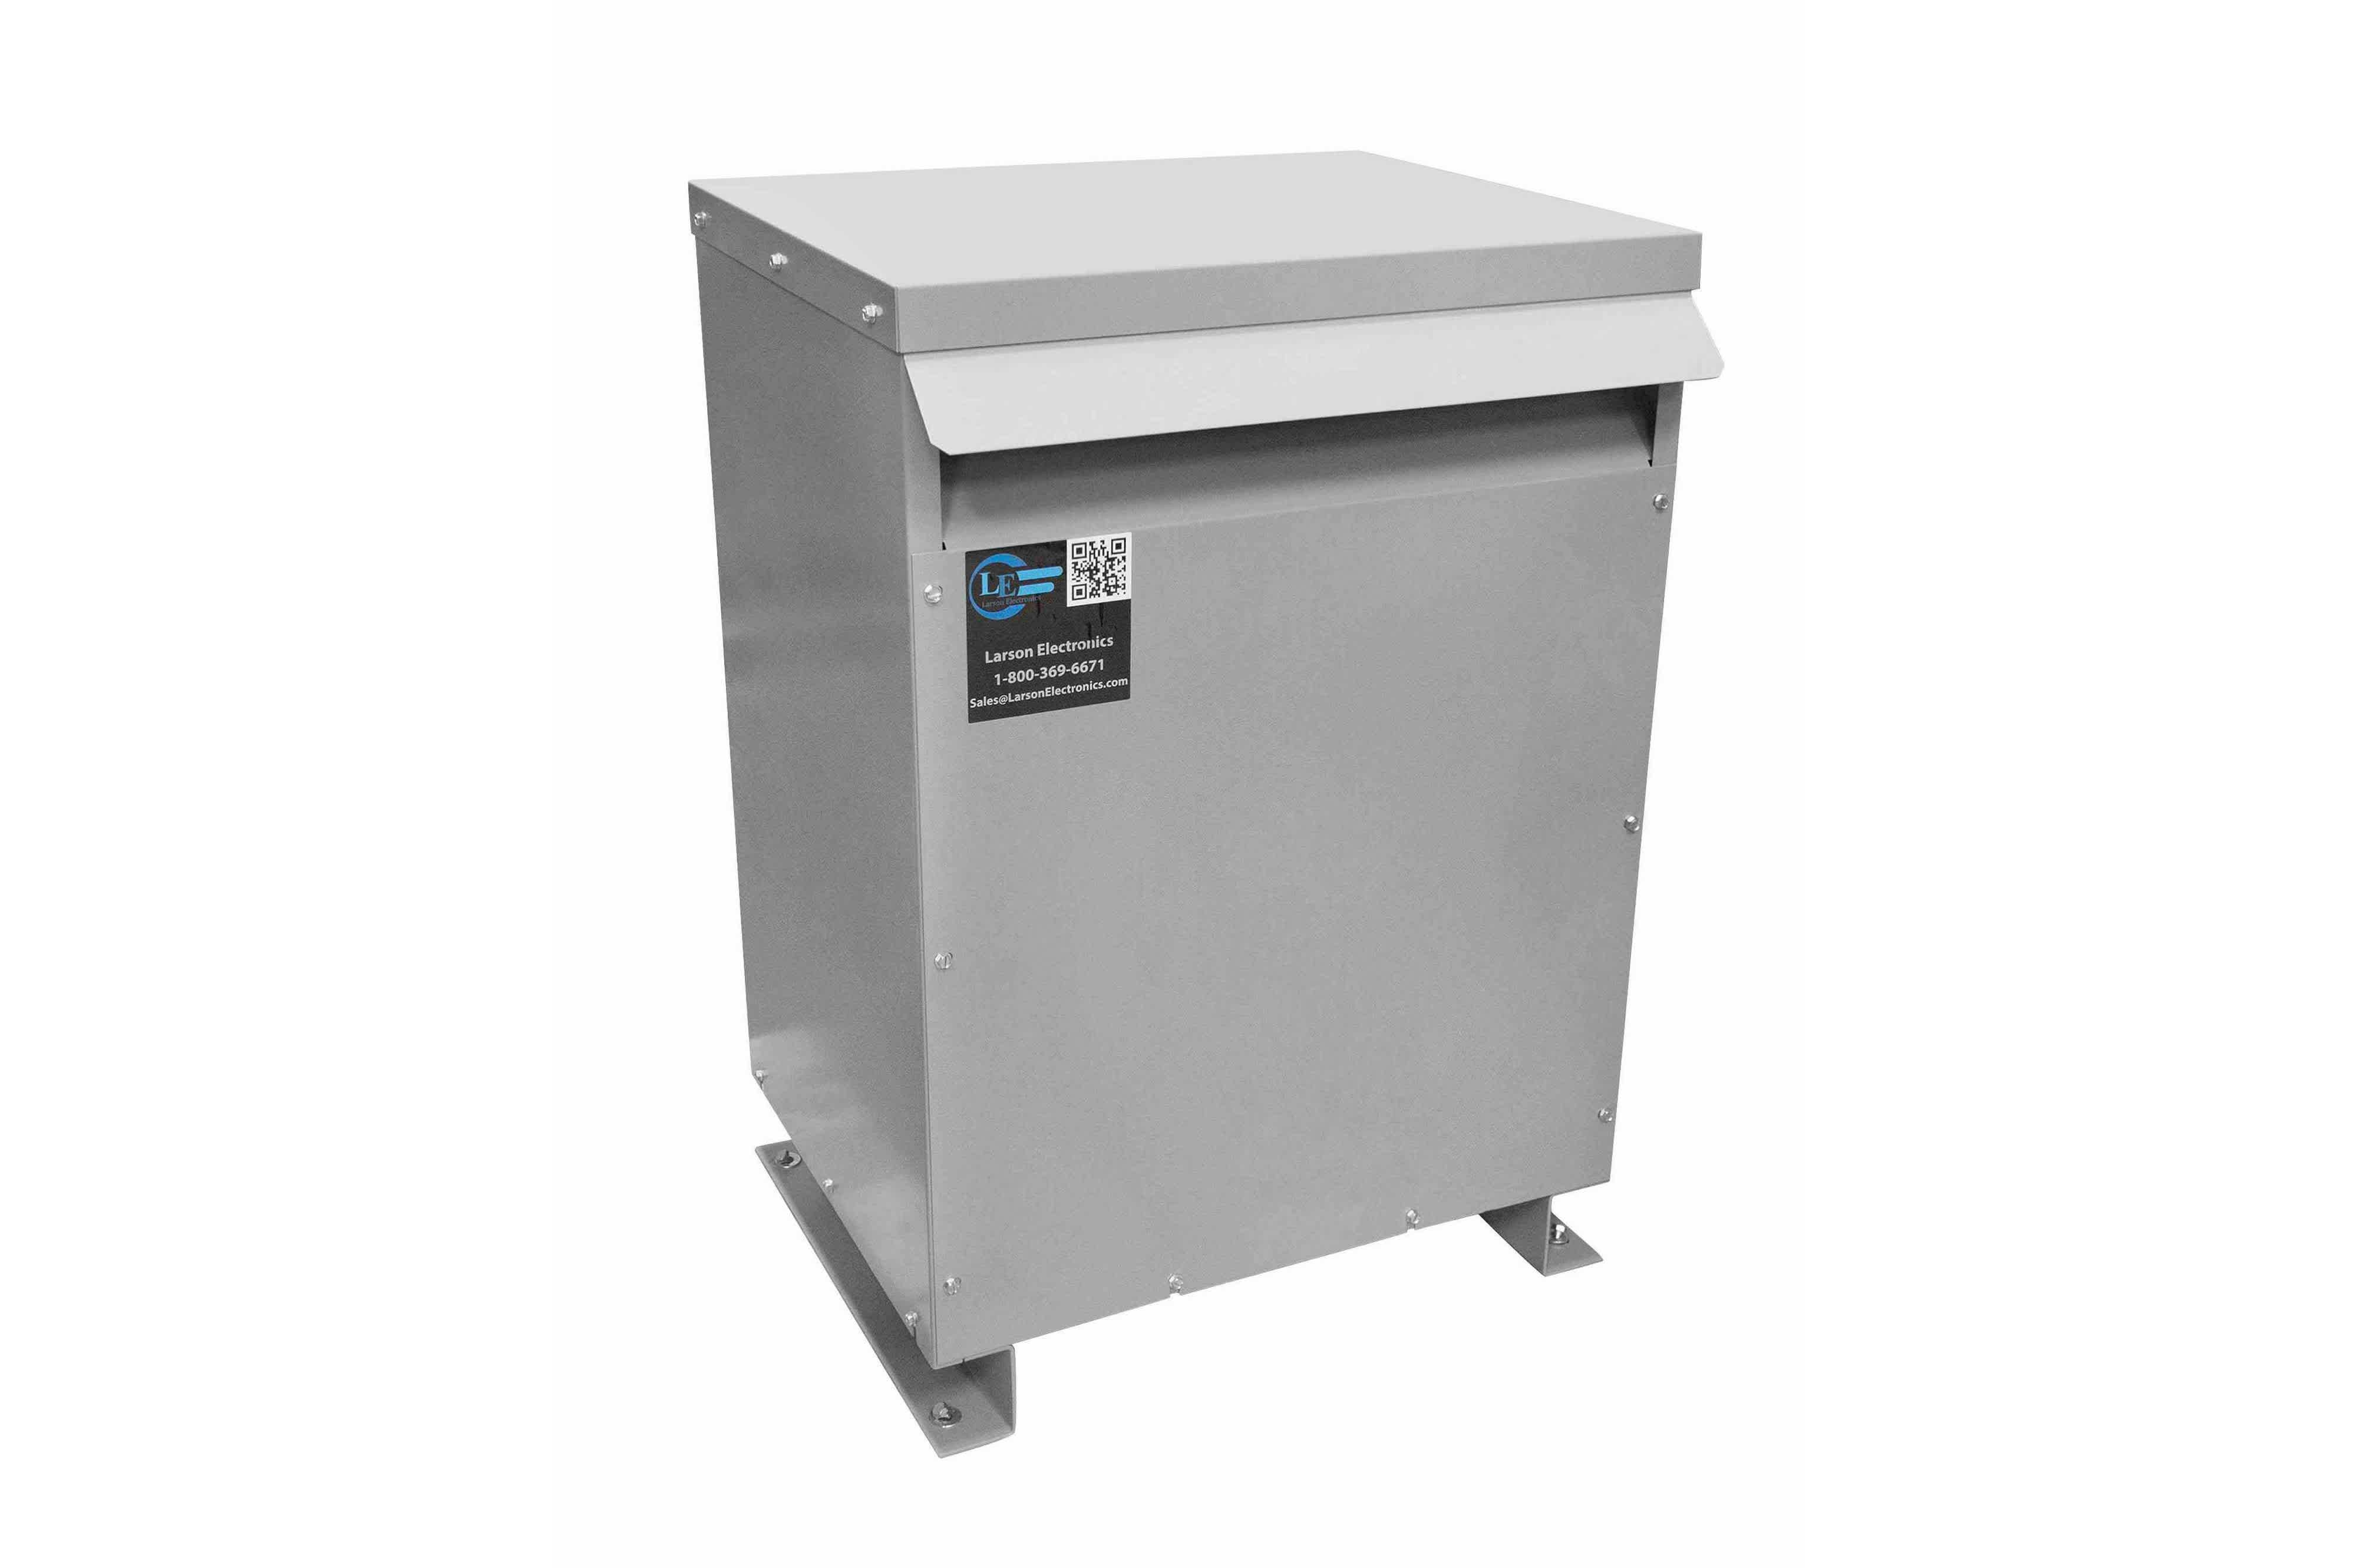 45 kVA 3PH Isolation Transformer, 240V Wye Primary, 208V Delta Secondary, N3R, Ventilated, 60 Hz